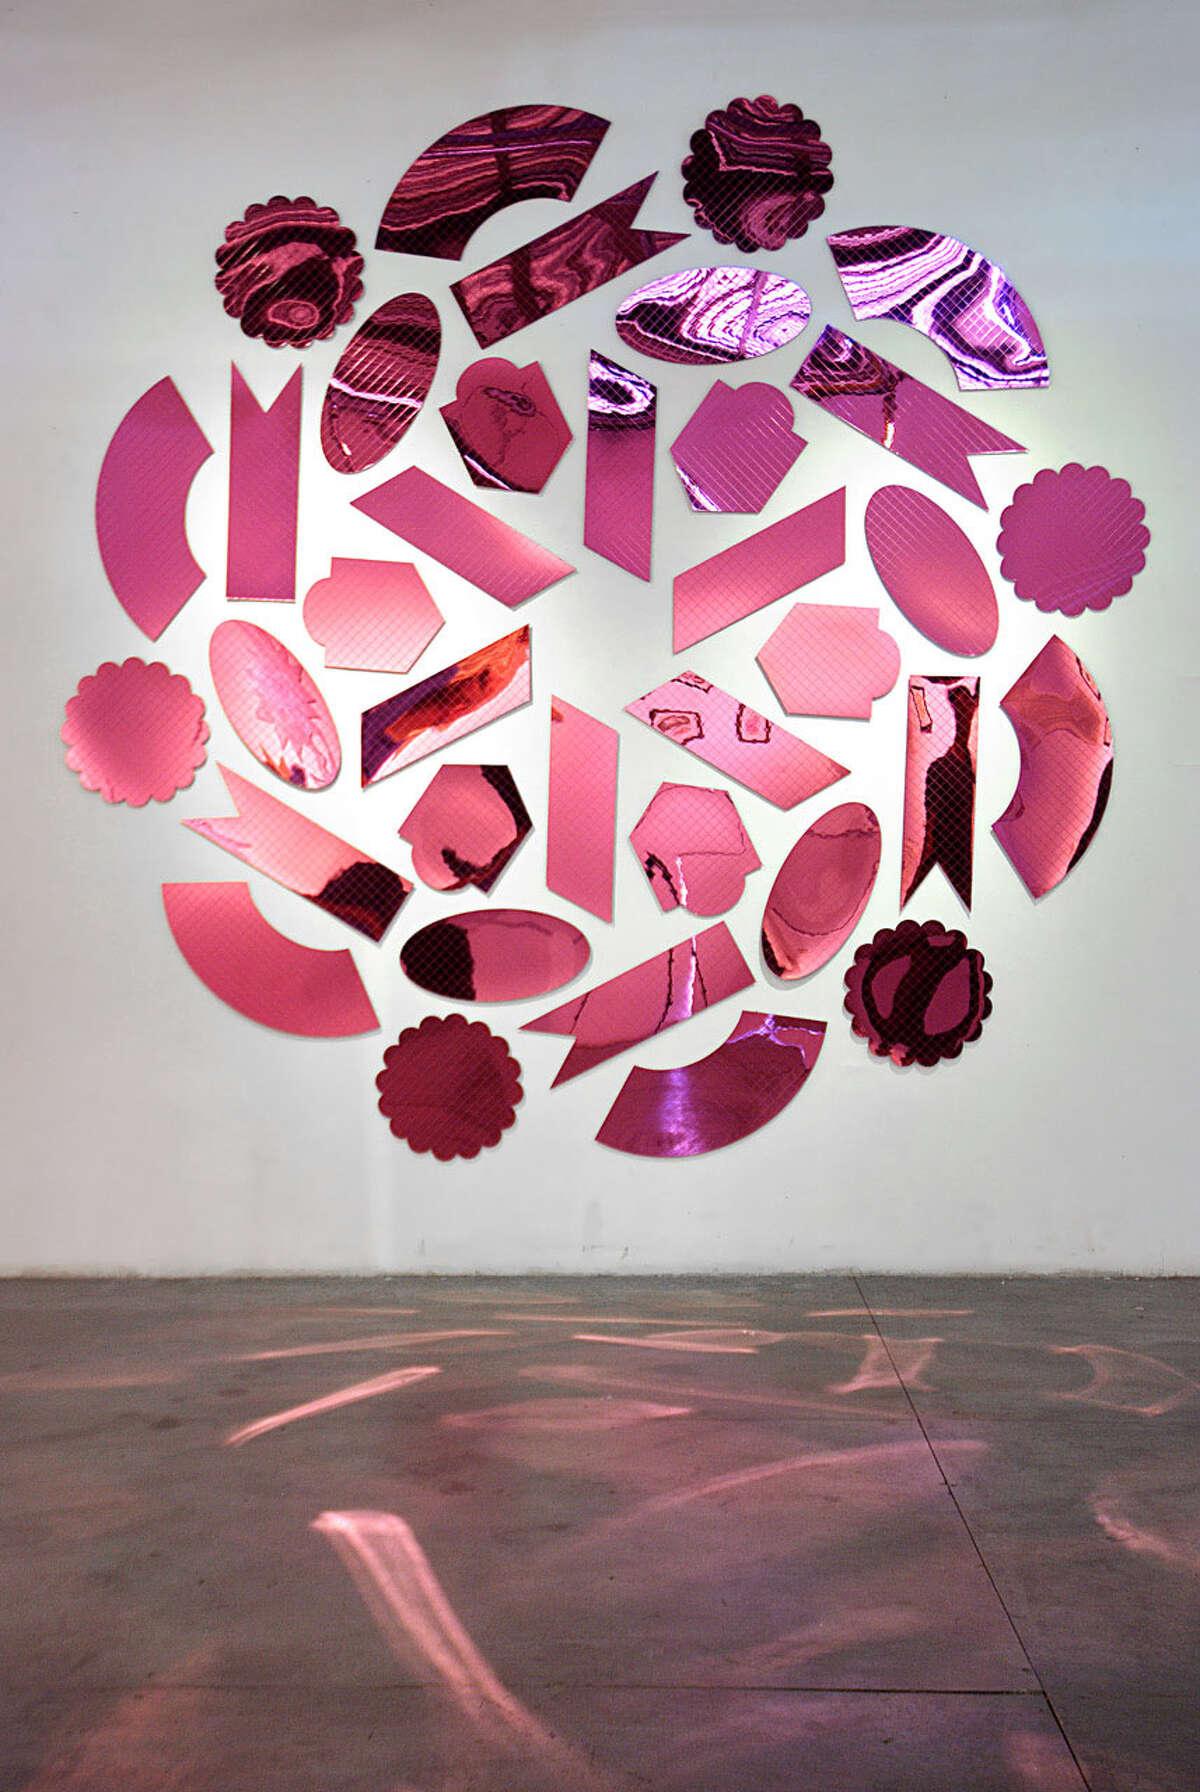 Amelia Toelke, Dragonfruit, 2014. Mirrored acrylic. (Photo courtesy the gallery)